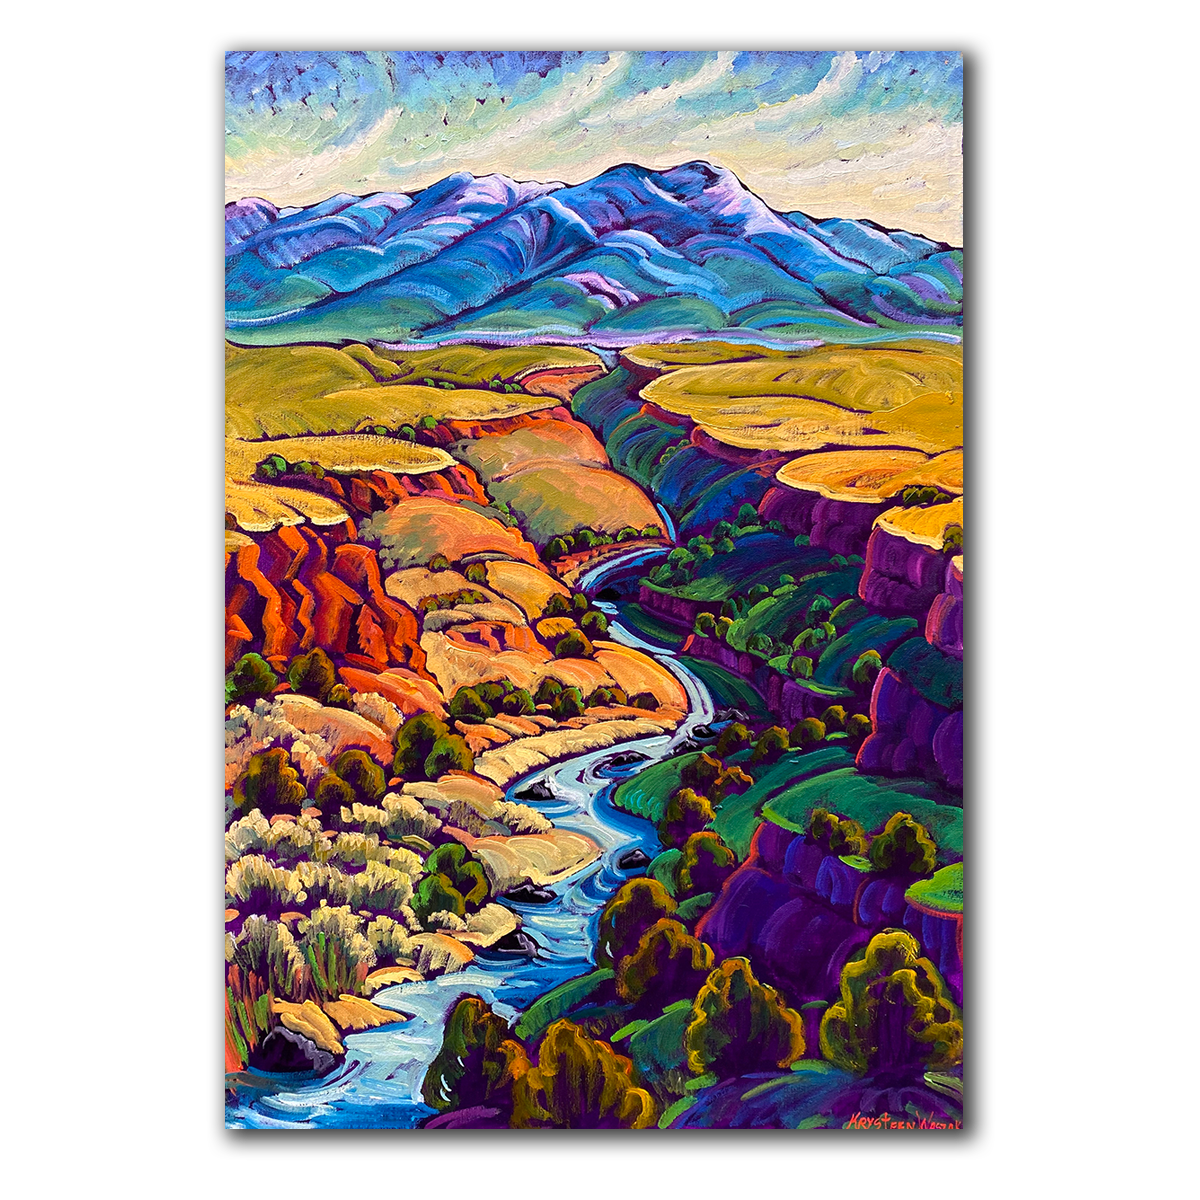 Canyon and River Runs Through It 20x30